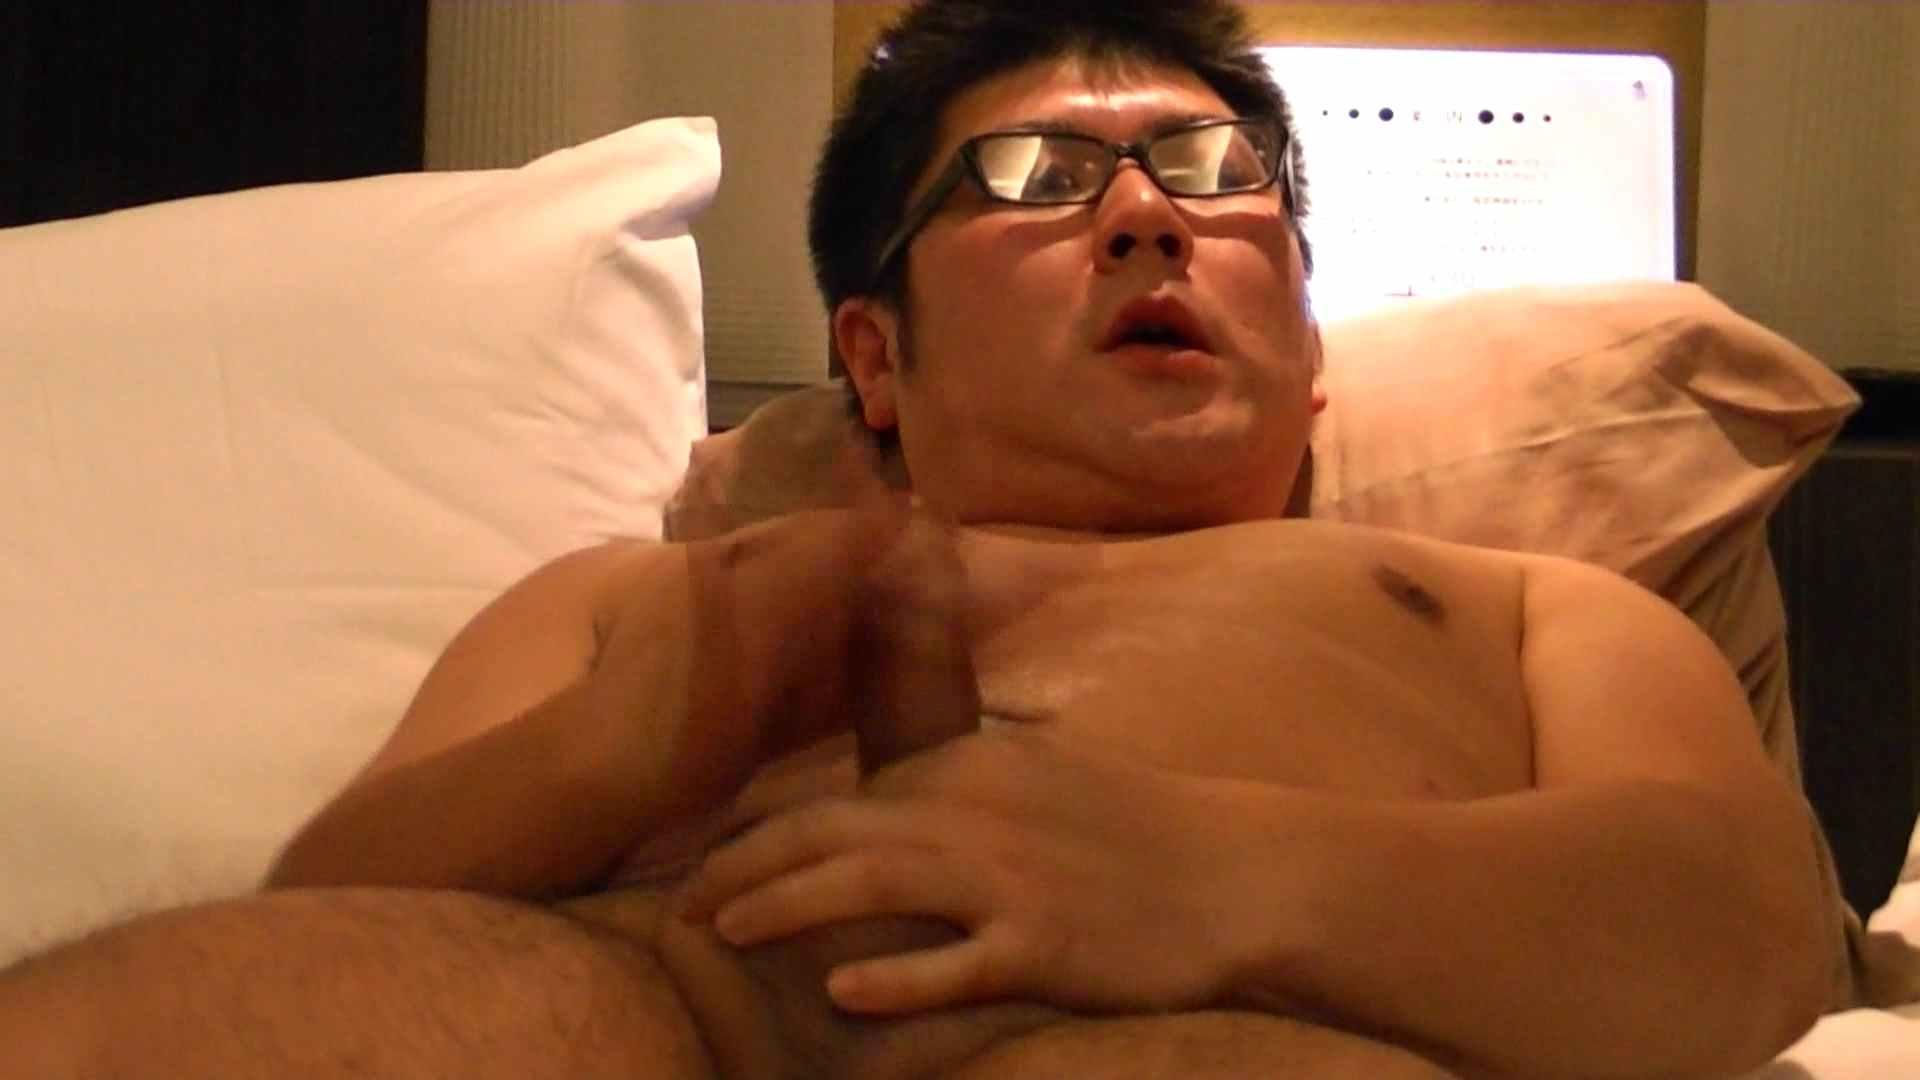 Mr.オナックスさん投稿!HD 貴方のオナニー三万円で撮影させてください。VOL.03 後編 オナニー編 ゲイAV画像 106枚 98